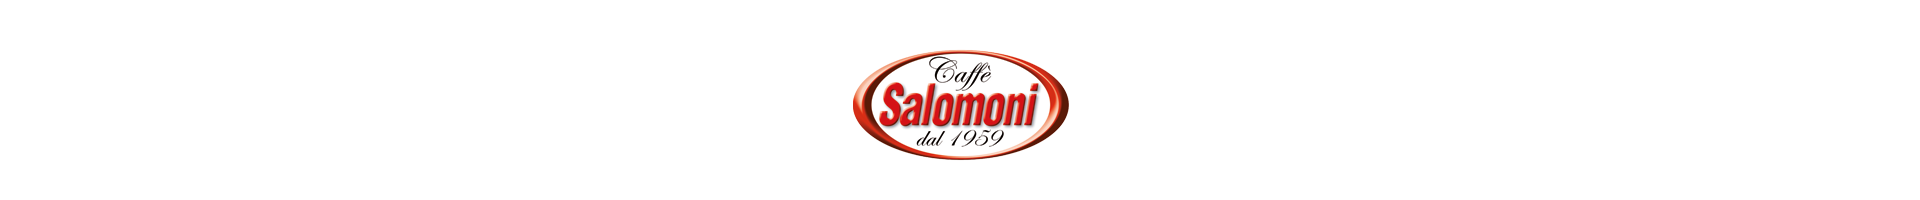 Salomoni